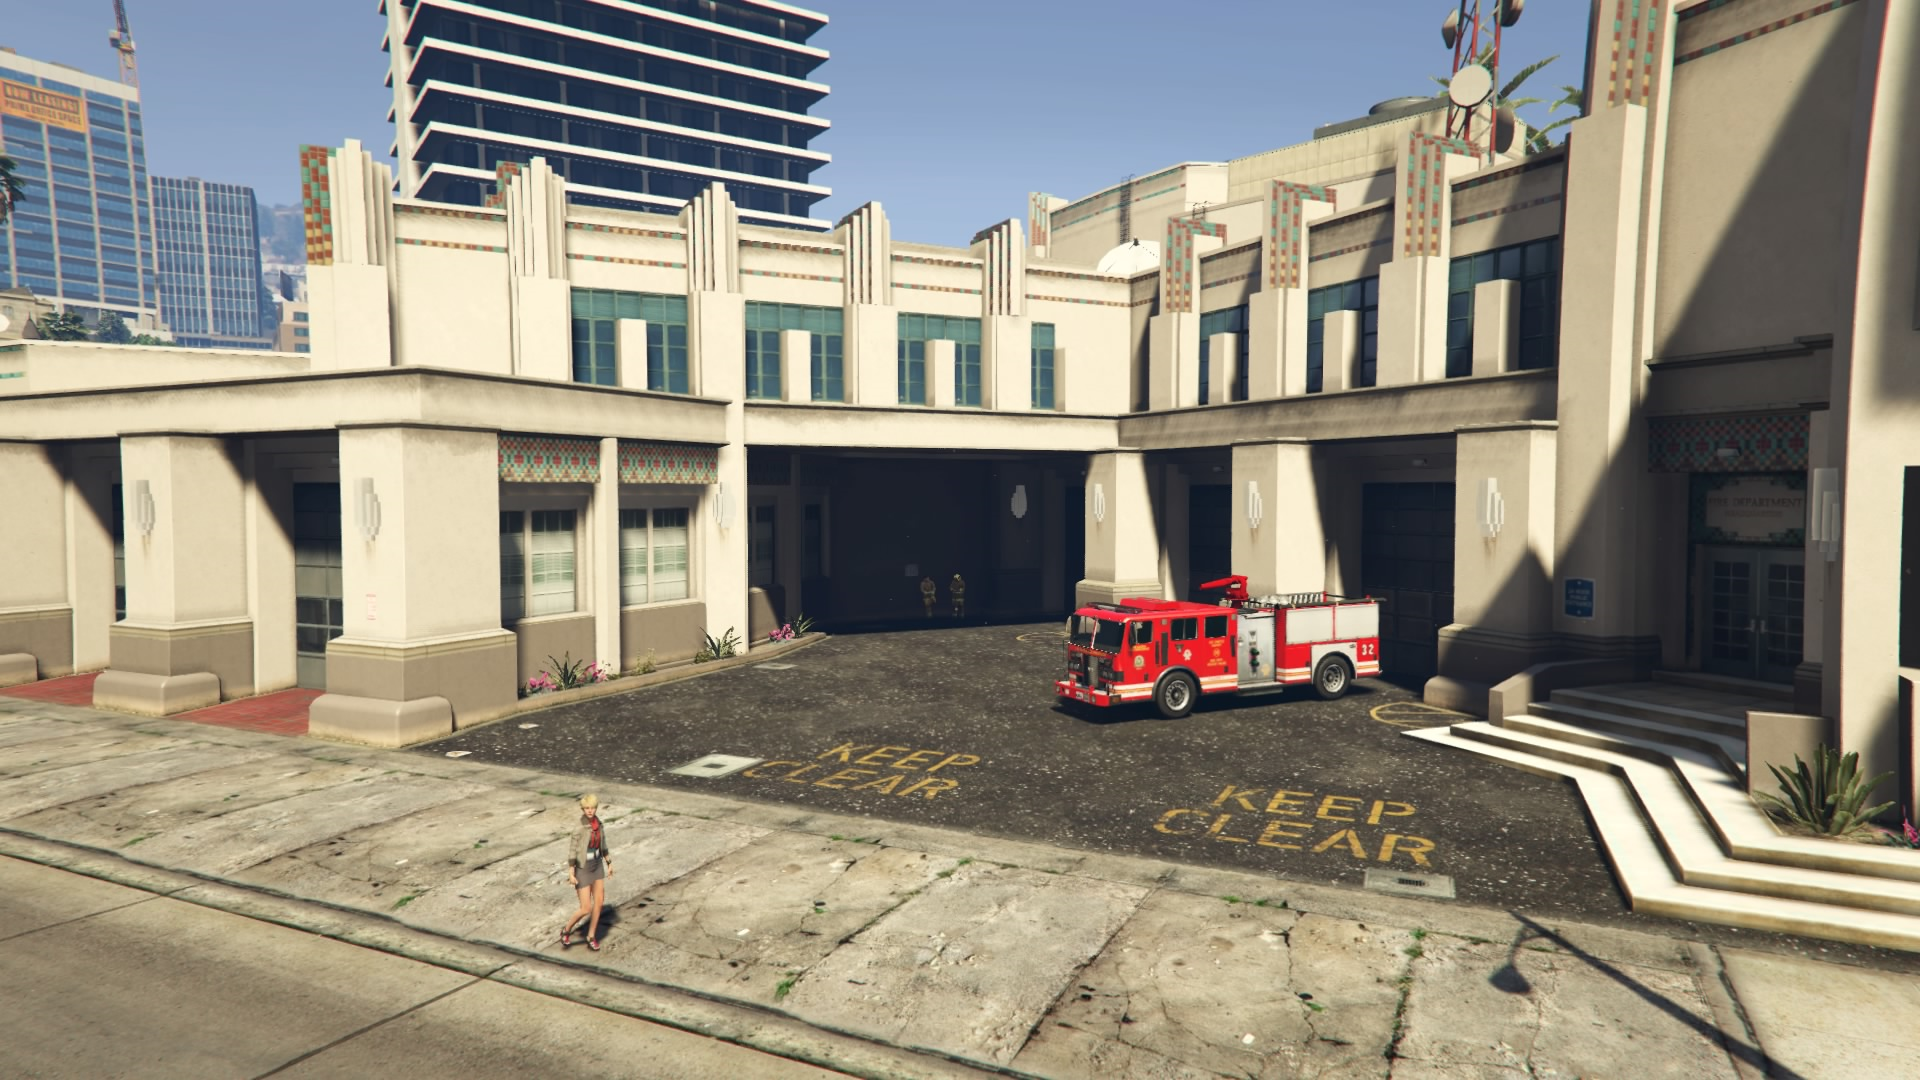 Rockford Hills Fire Station